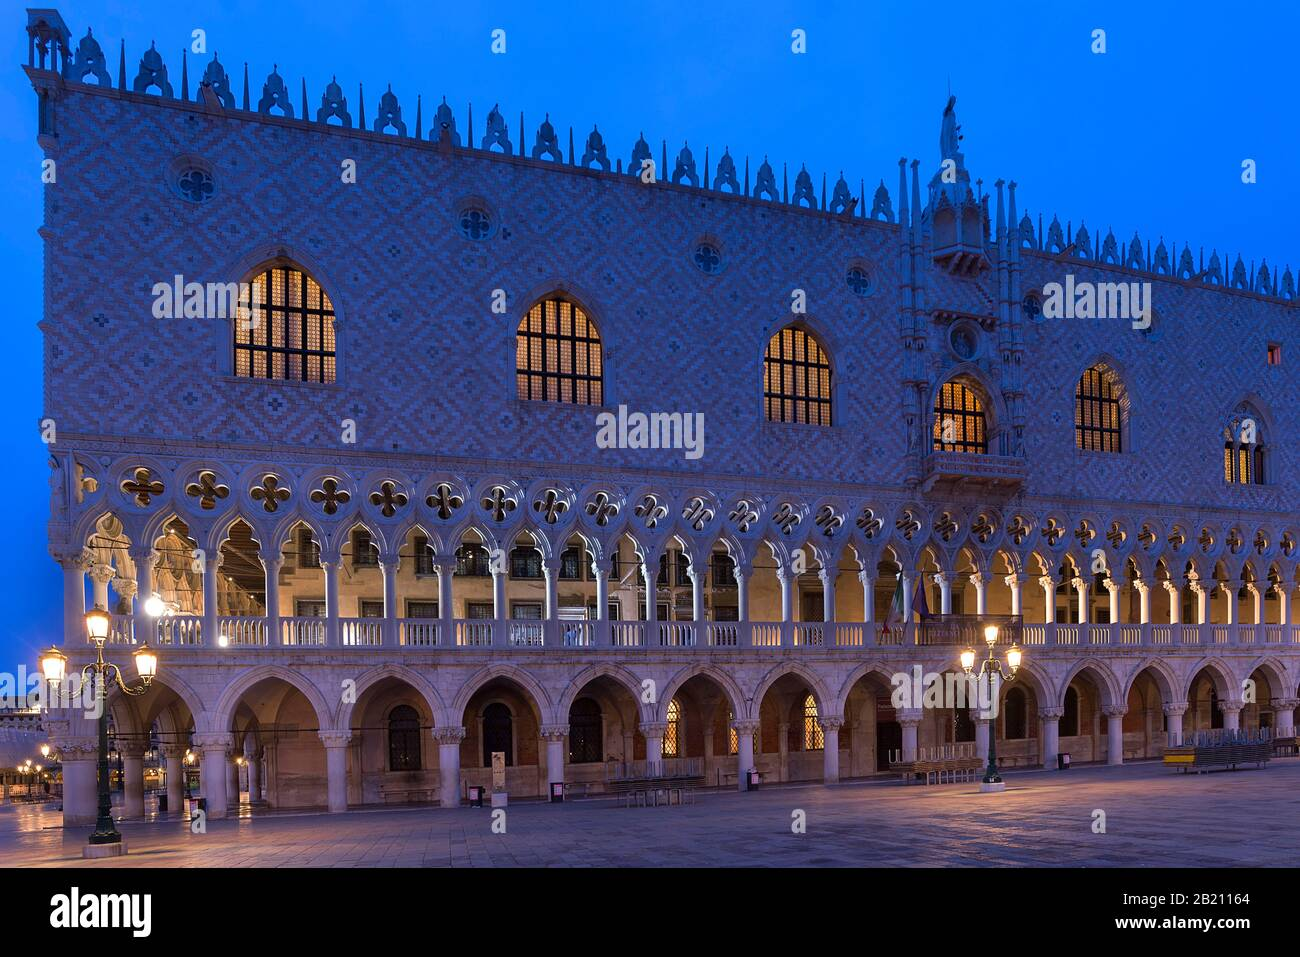 Illuminated Doge's Palace in the evening, Piazza San Marco, Venice, Veneto, Italy Stock Photo